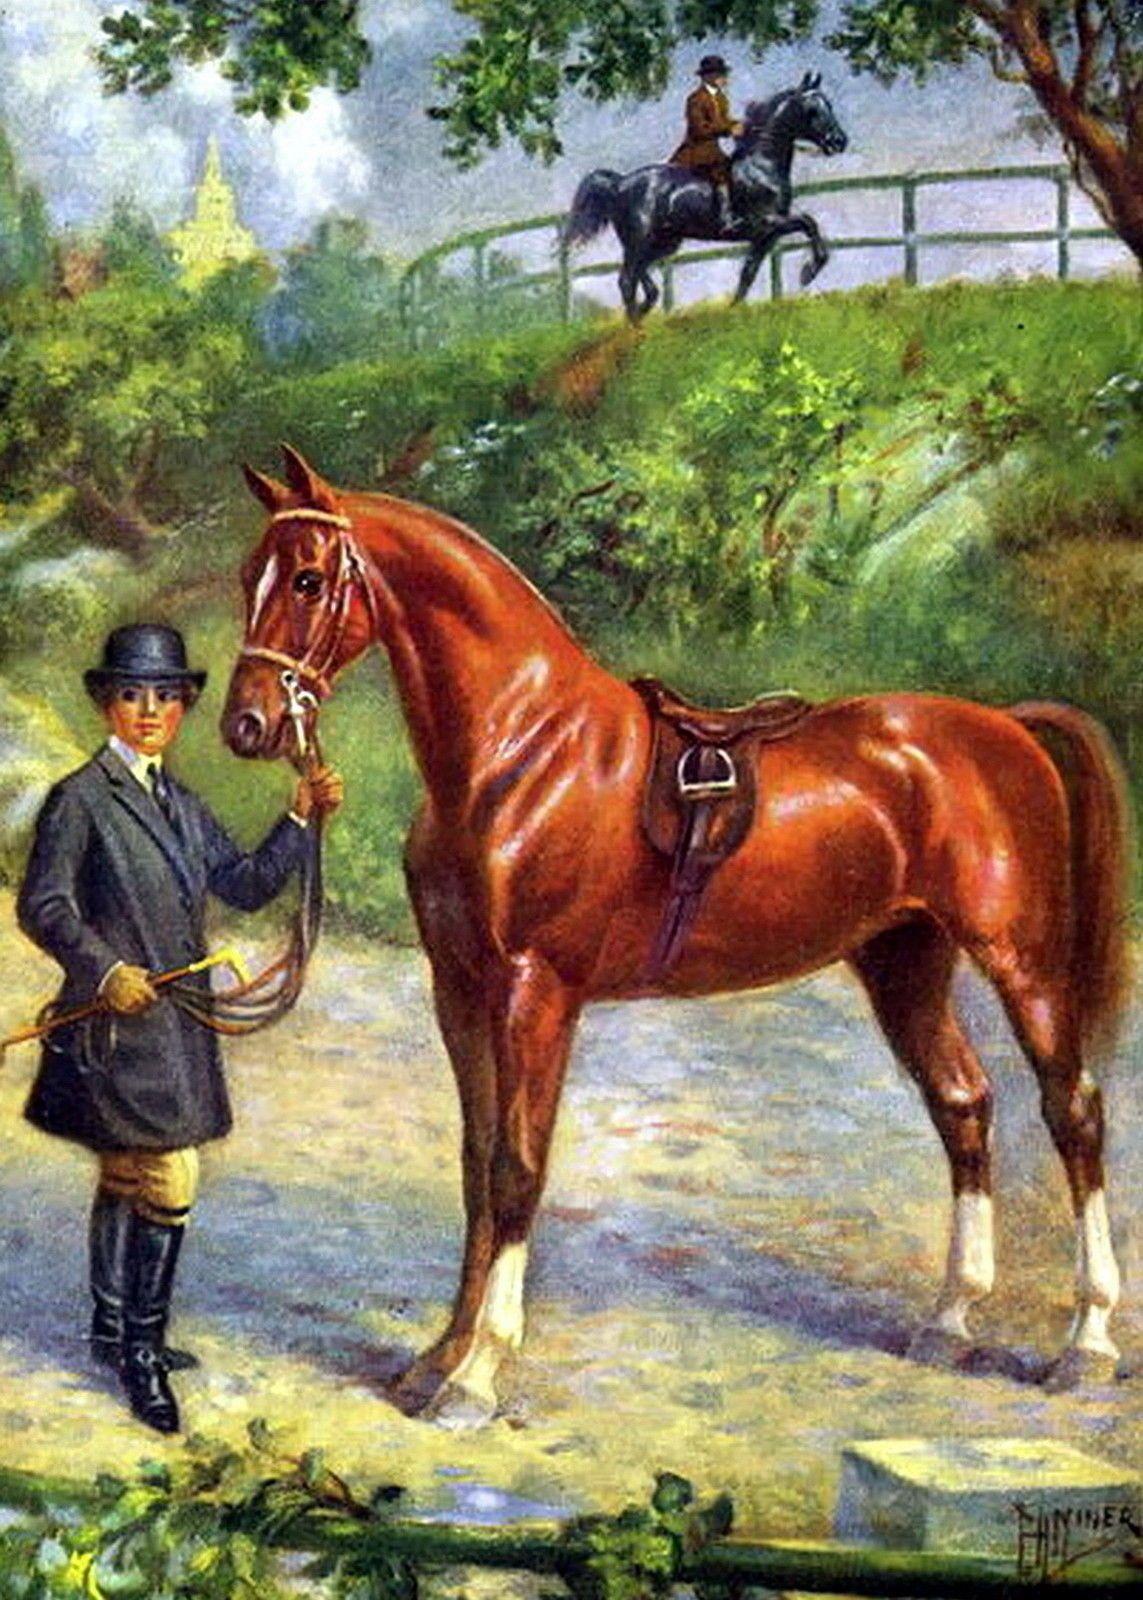 8x10 Equestrian Print American Saddle Horse Saddlebred Parade Mount Trail Riding 5 00 Art Print American Saddlebred Saddle Horse Horse Painting Art Horses [ 1600 x 1143 Pixel ]